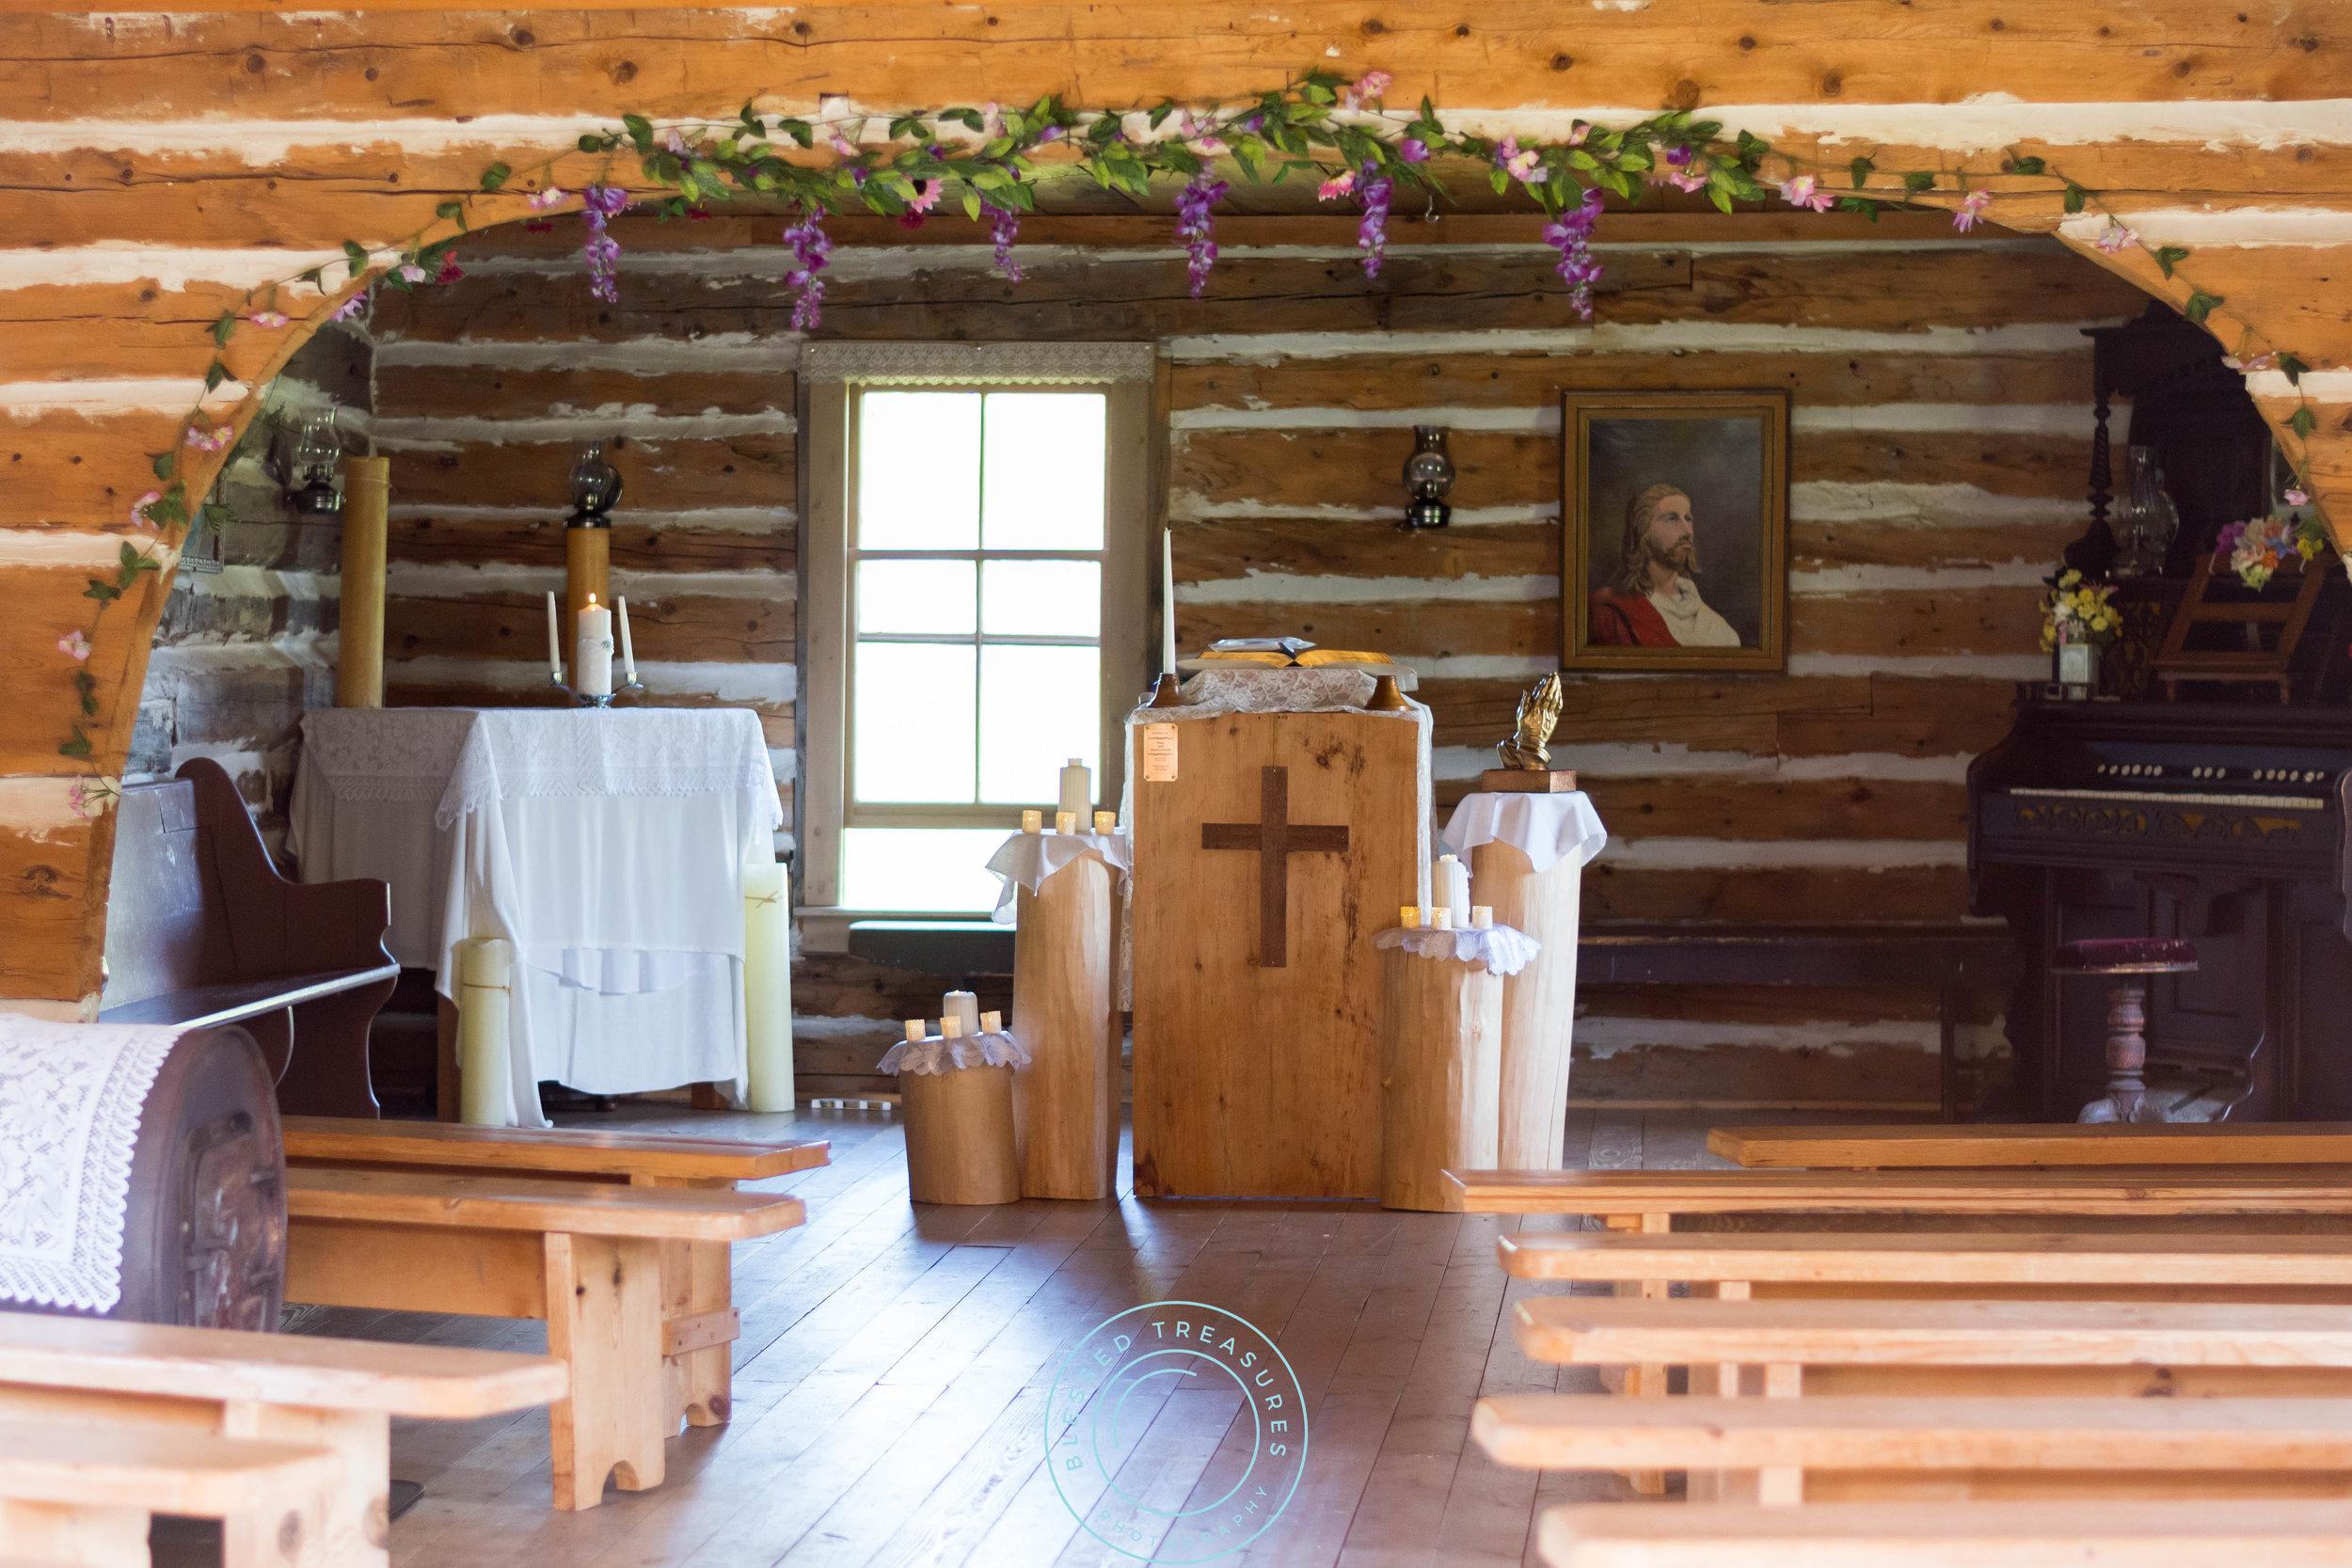 Mansfield township pioneer church crystal falls michigan wedding location